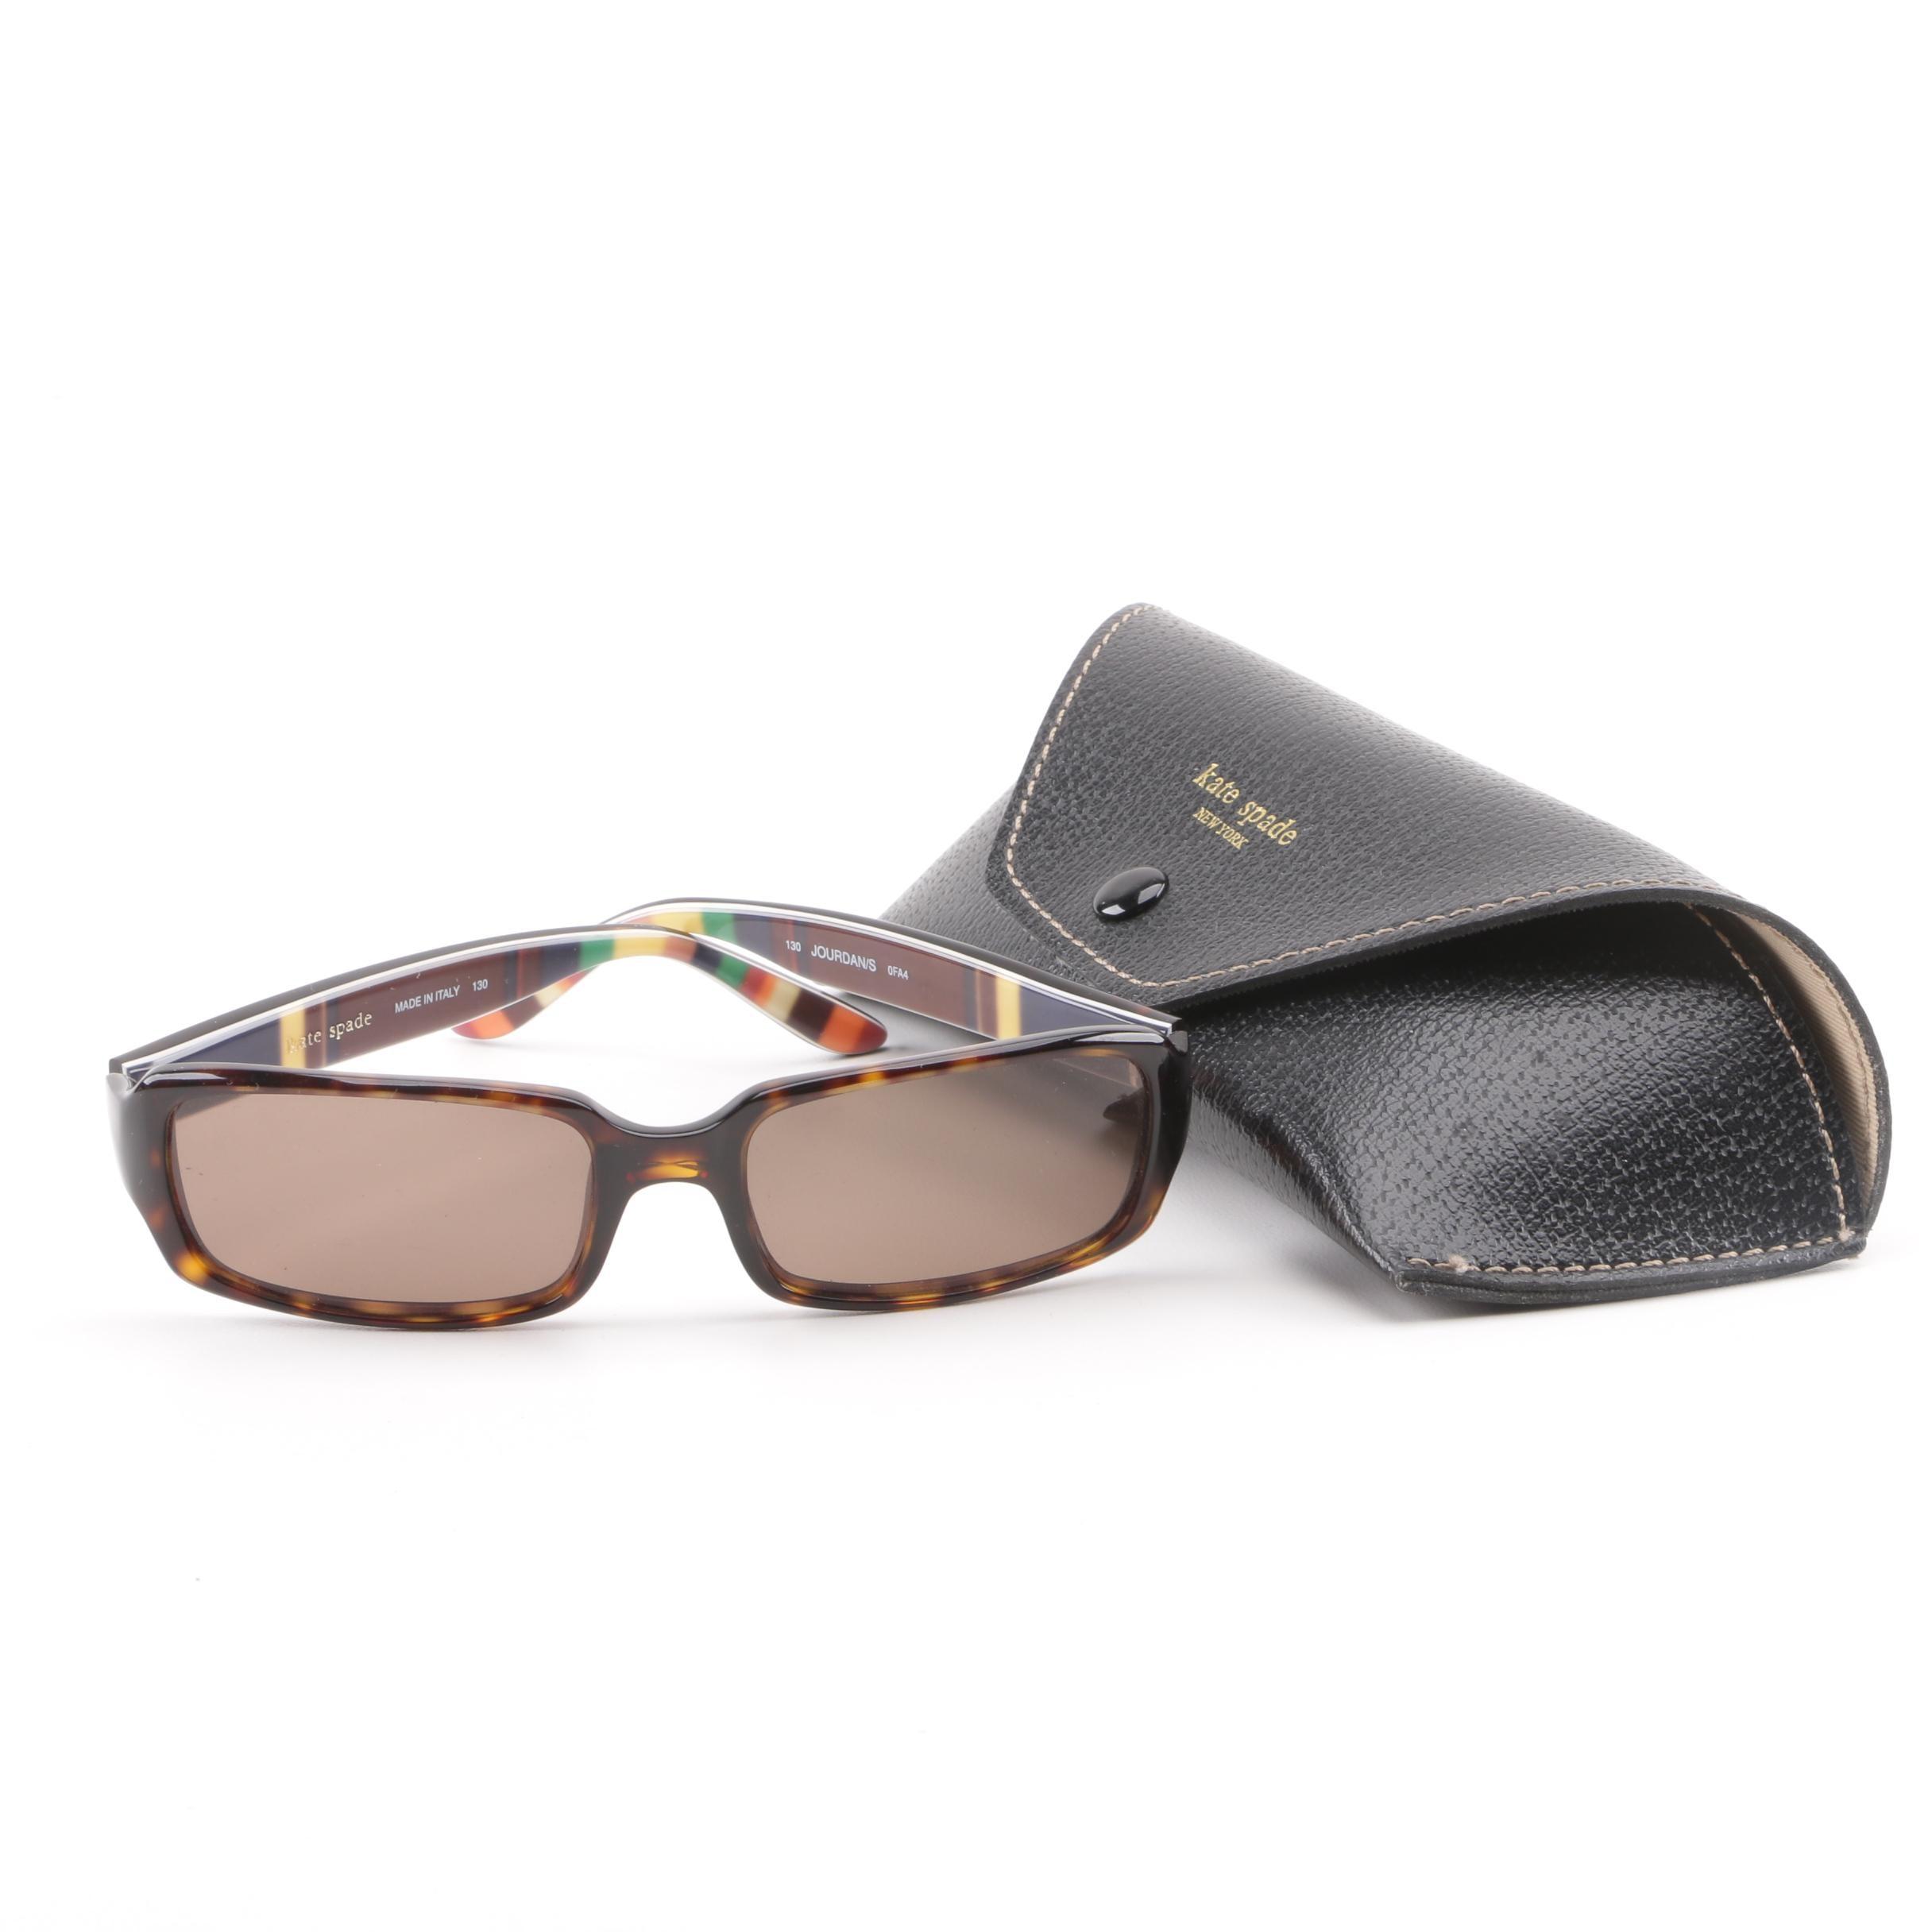 Kate Spade New York Jourdan/S Sunglasses with Case